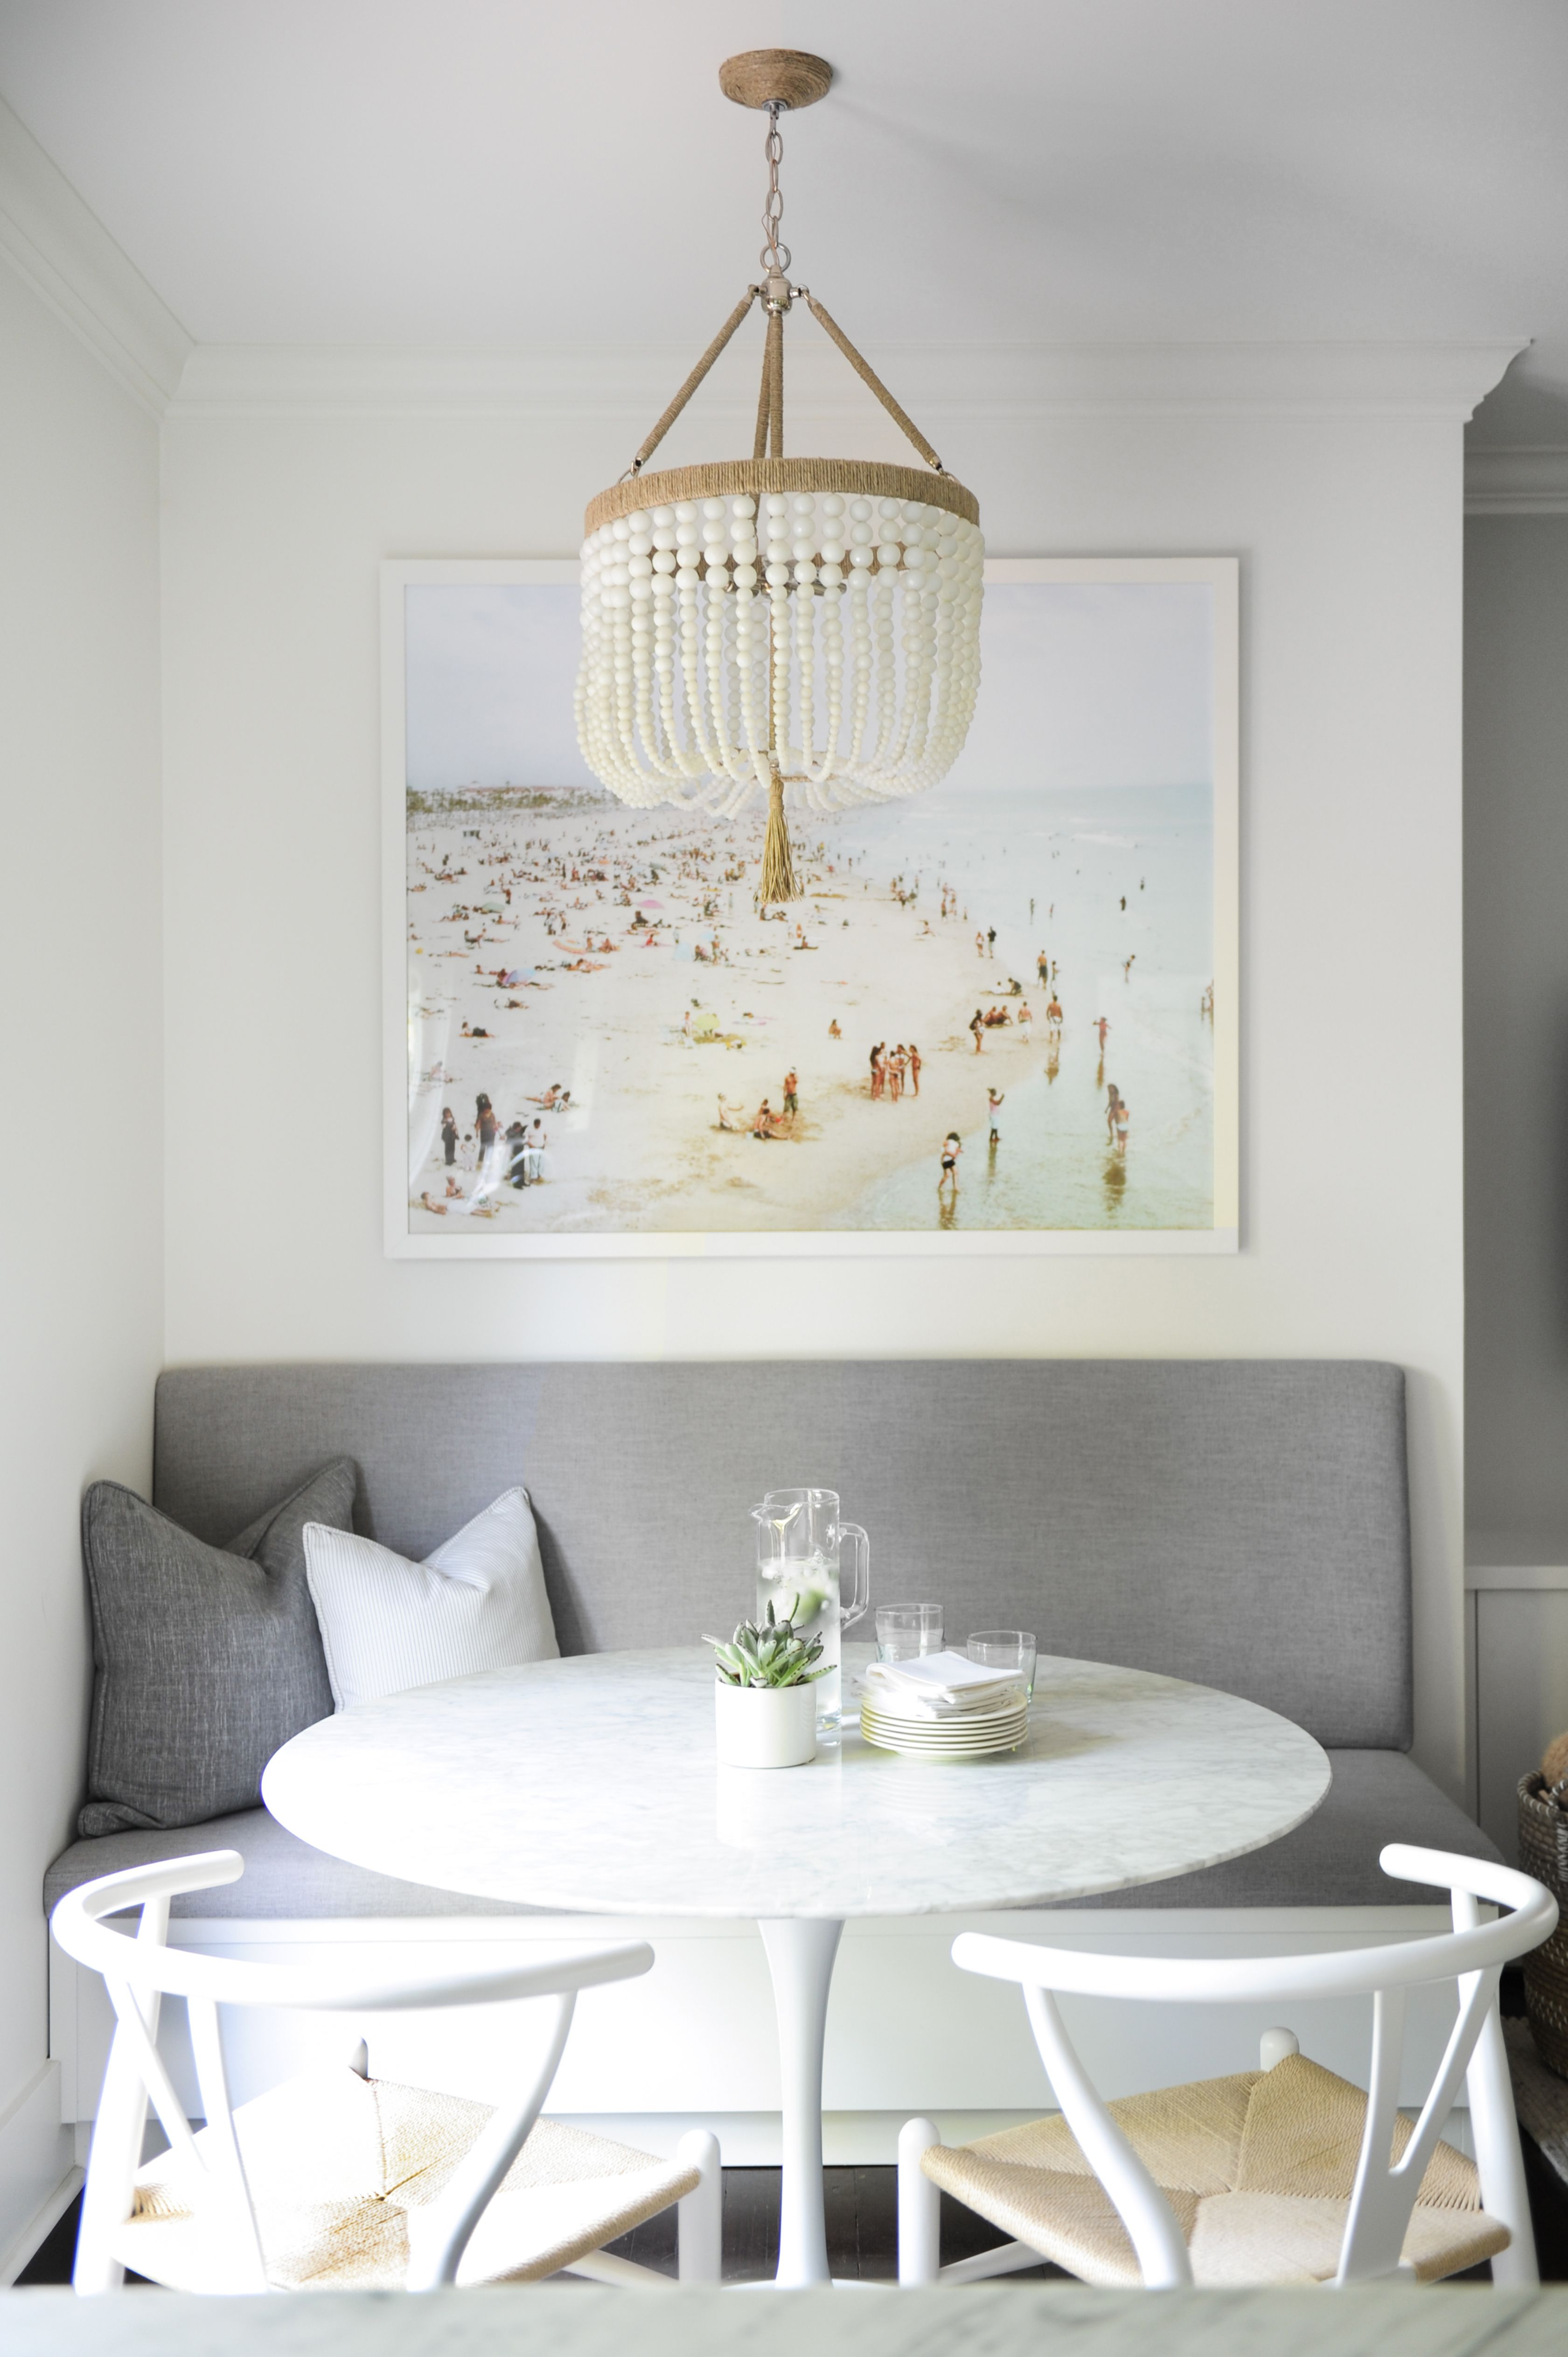 Home | Shift Interiors